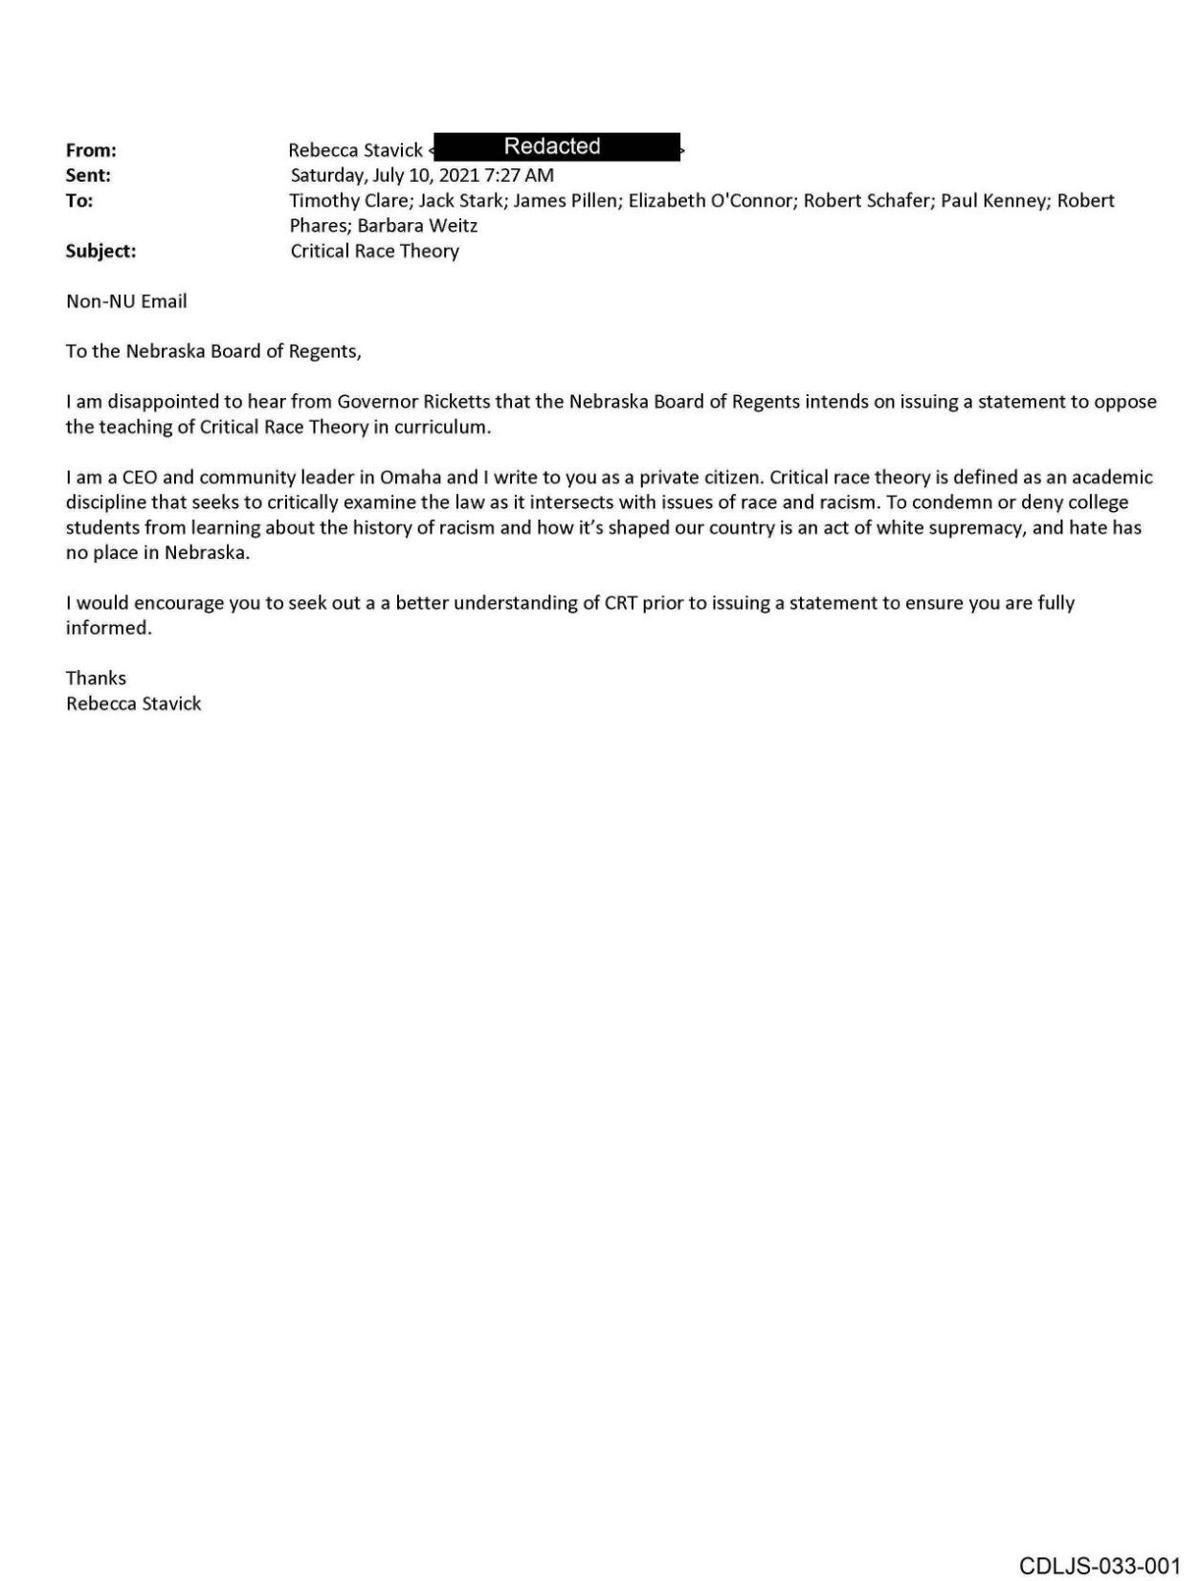 CDLJS-033-001.pdf